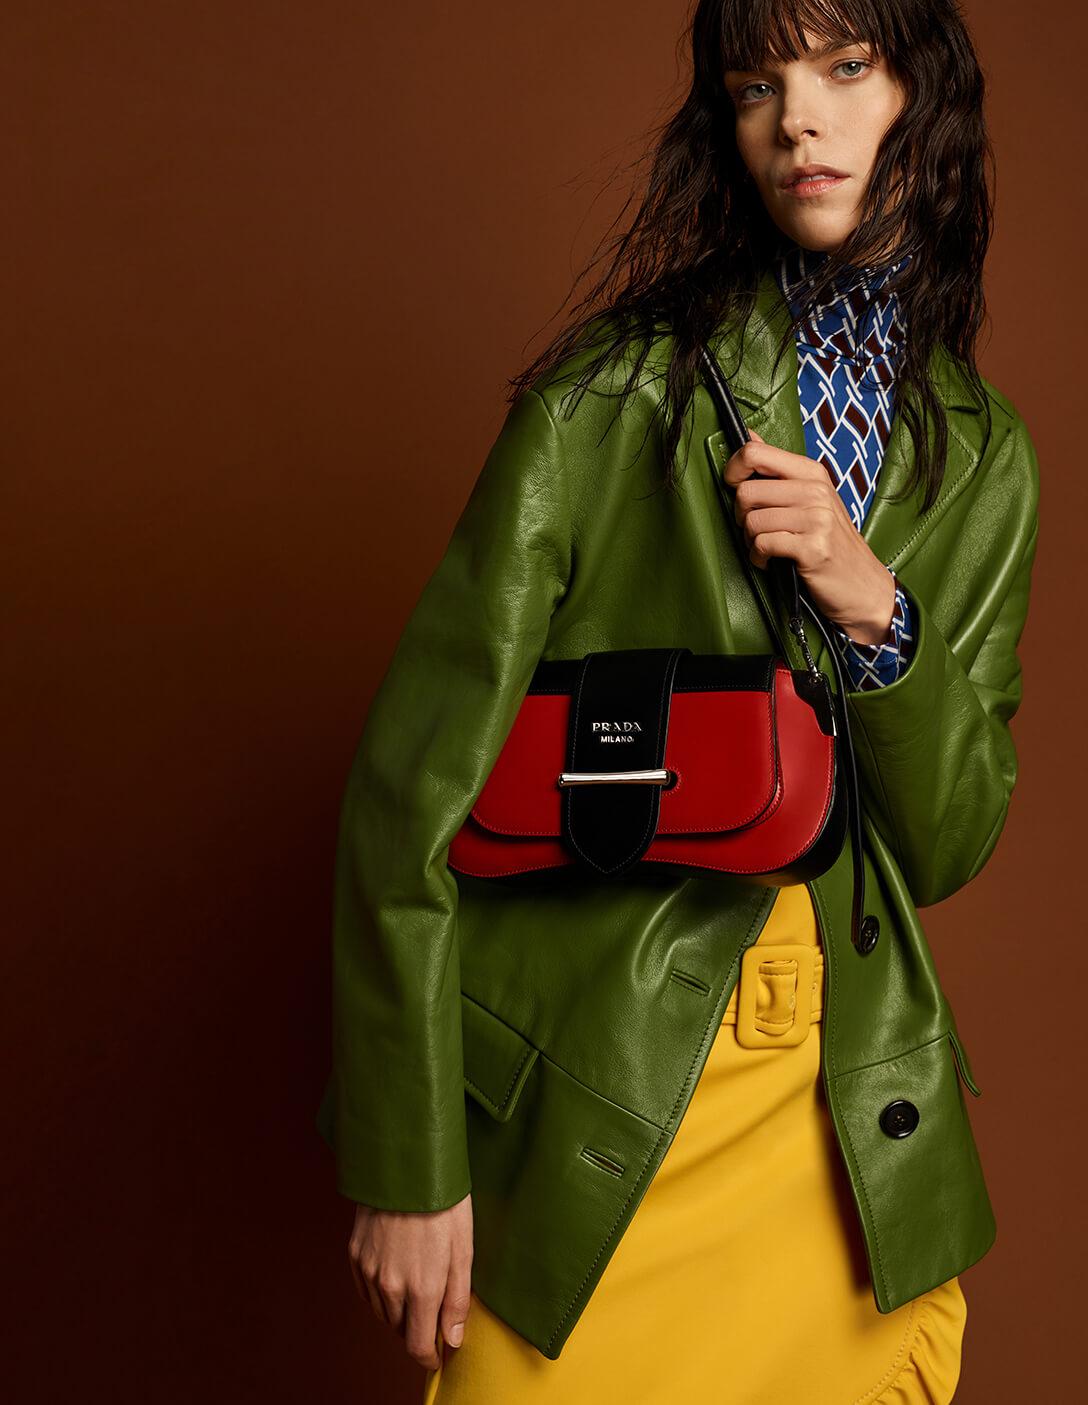 Prada model with red bag and green coat